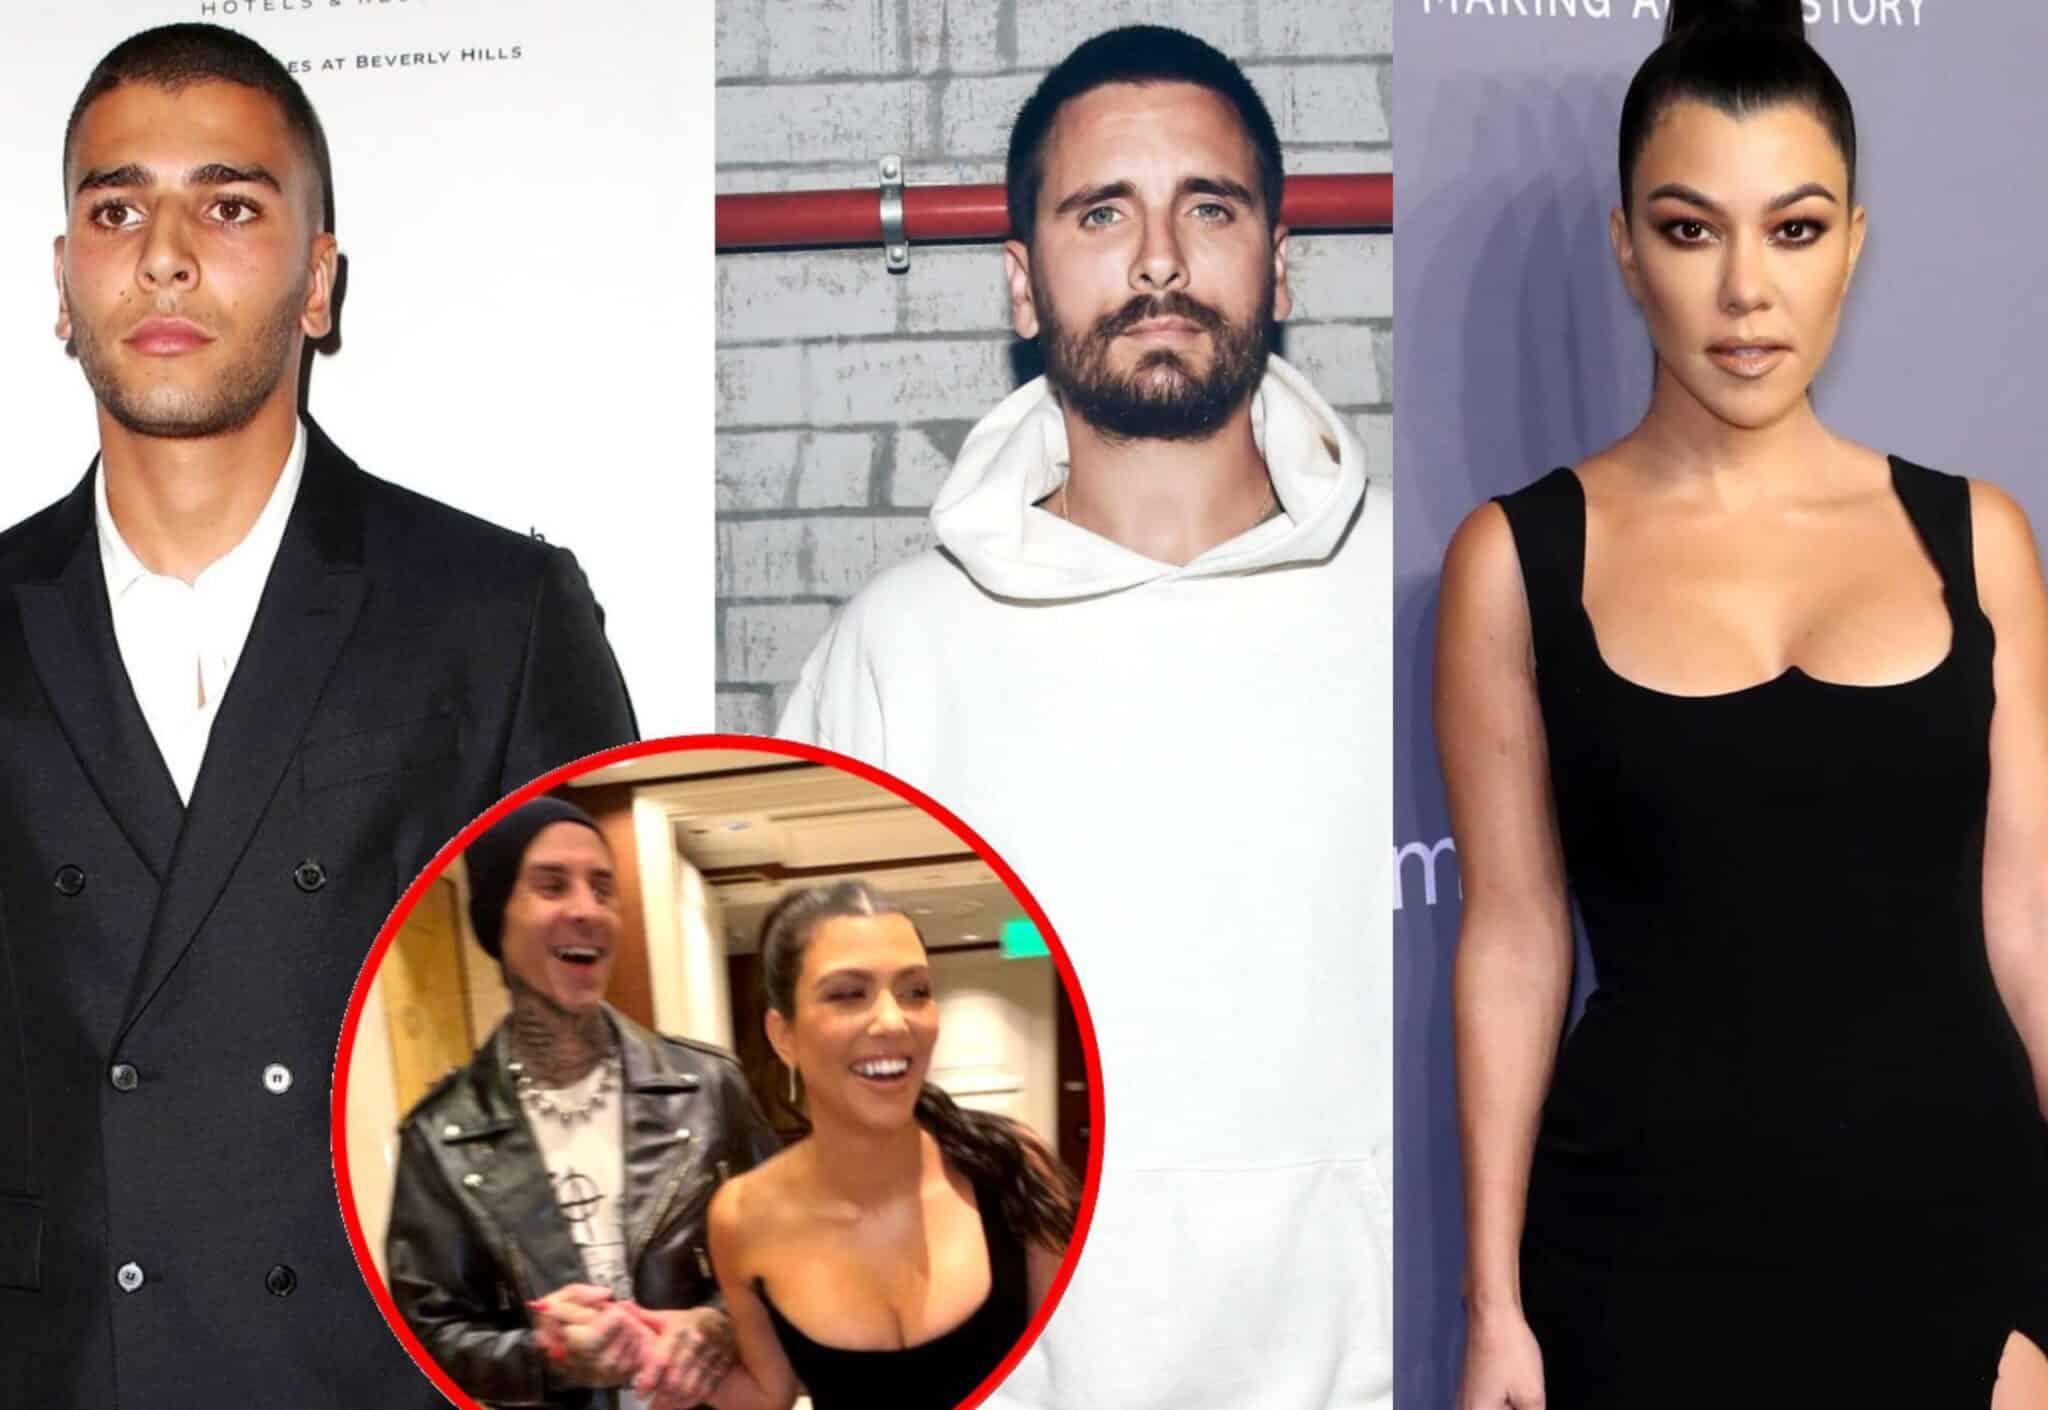 Alleged DM of Scott Disick Mocking Kourtney Kardashian's Relationship With Travis Barker Are Leaked by KUWTK Star's Ex Younes Bendjima